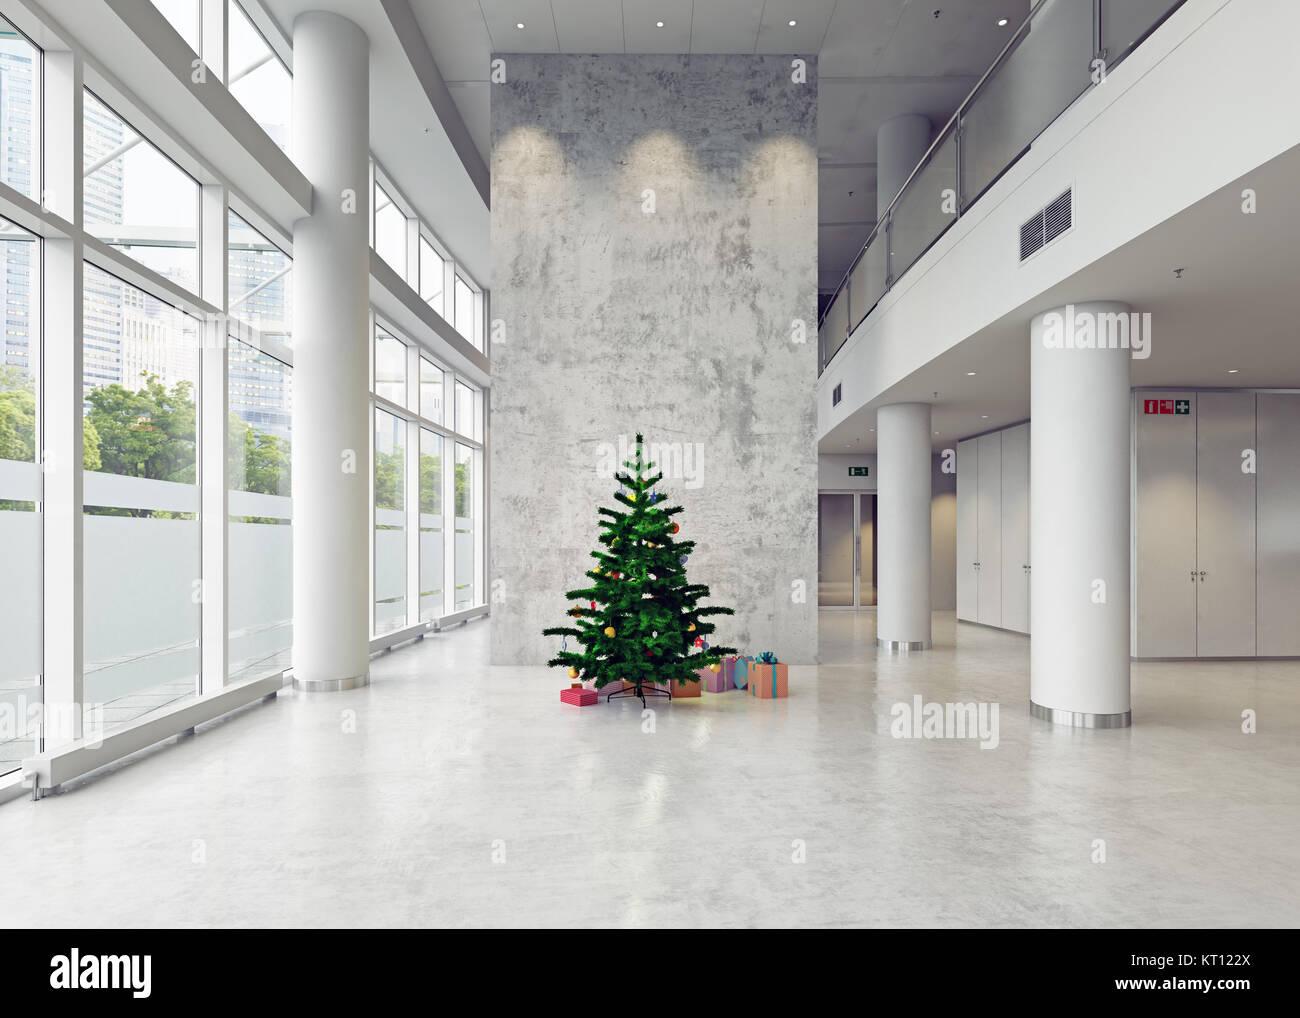 La moderna arquitectura de navidad, sala de negocios. Concepto 3d Imagen De Stock